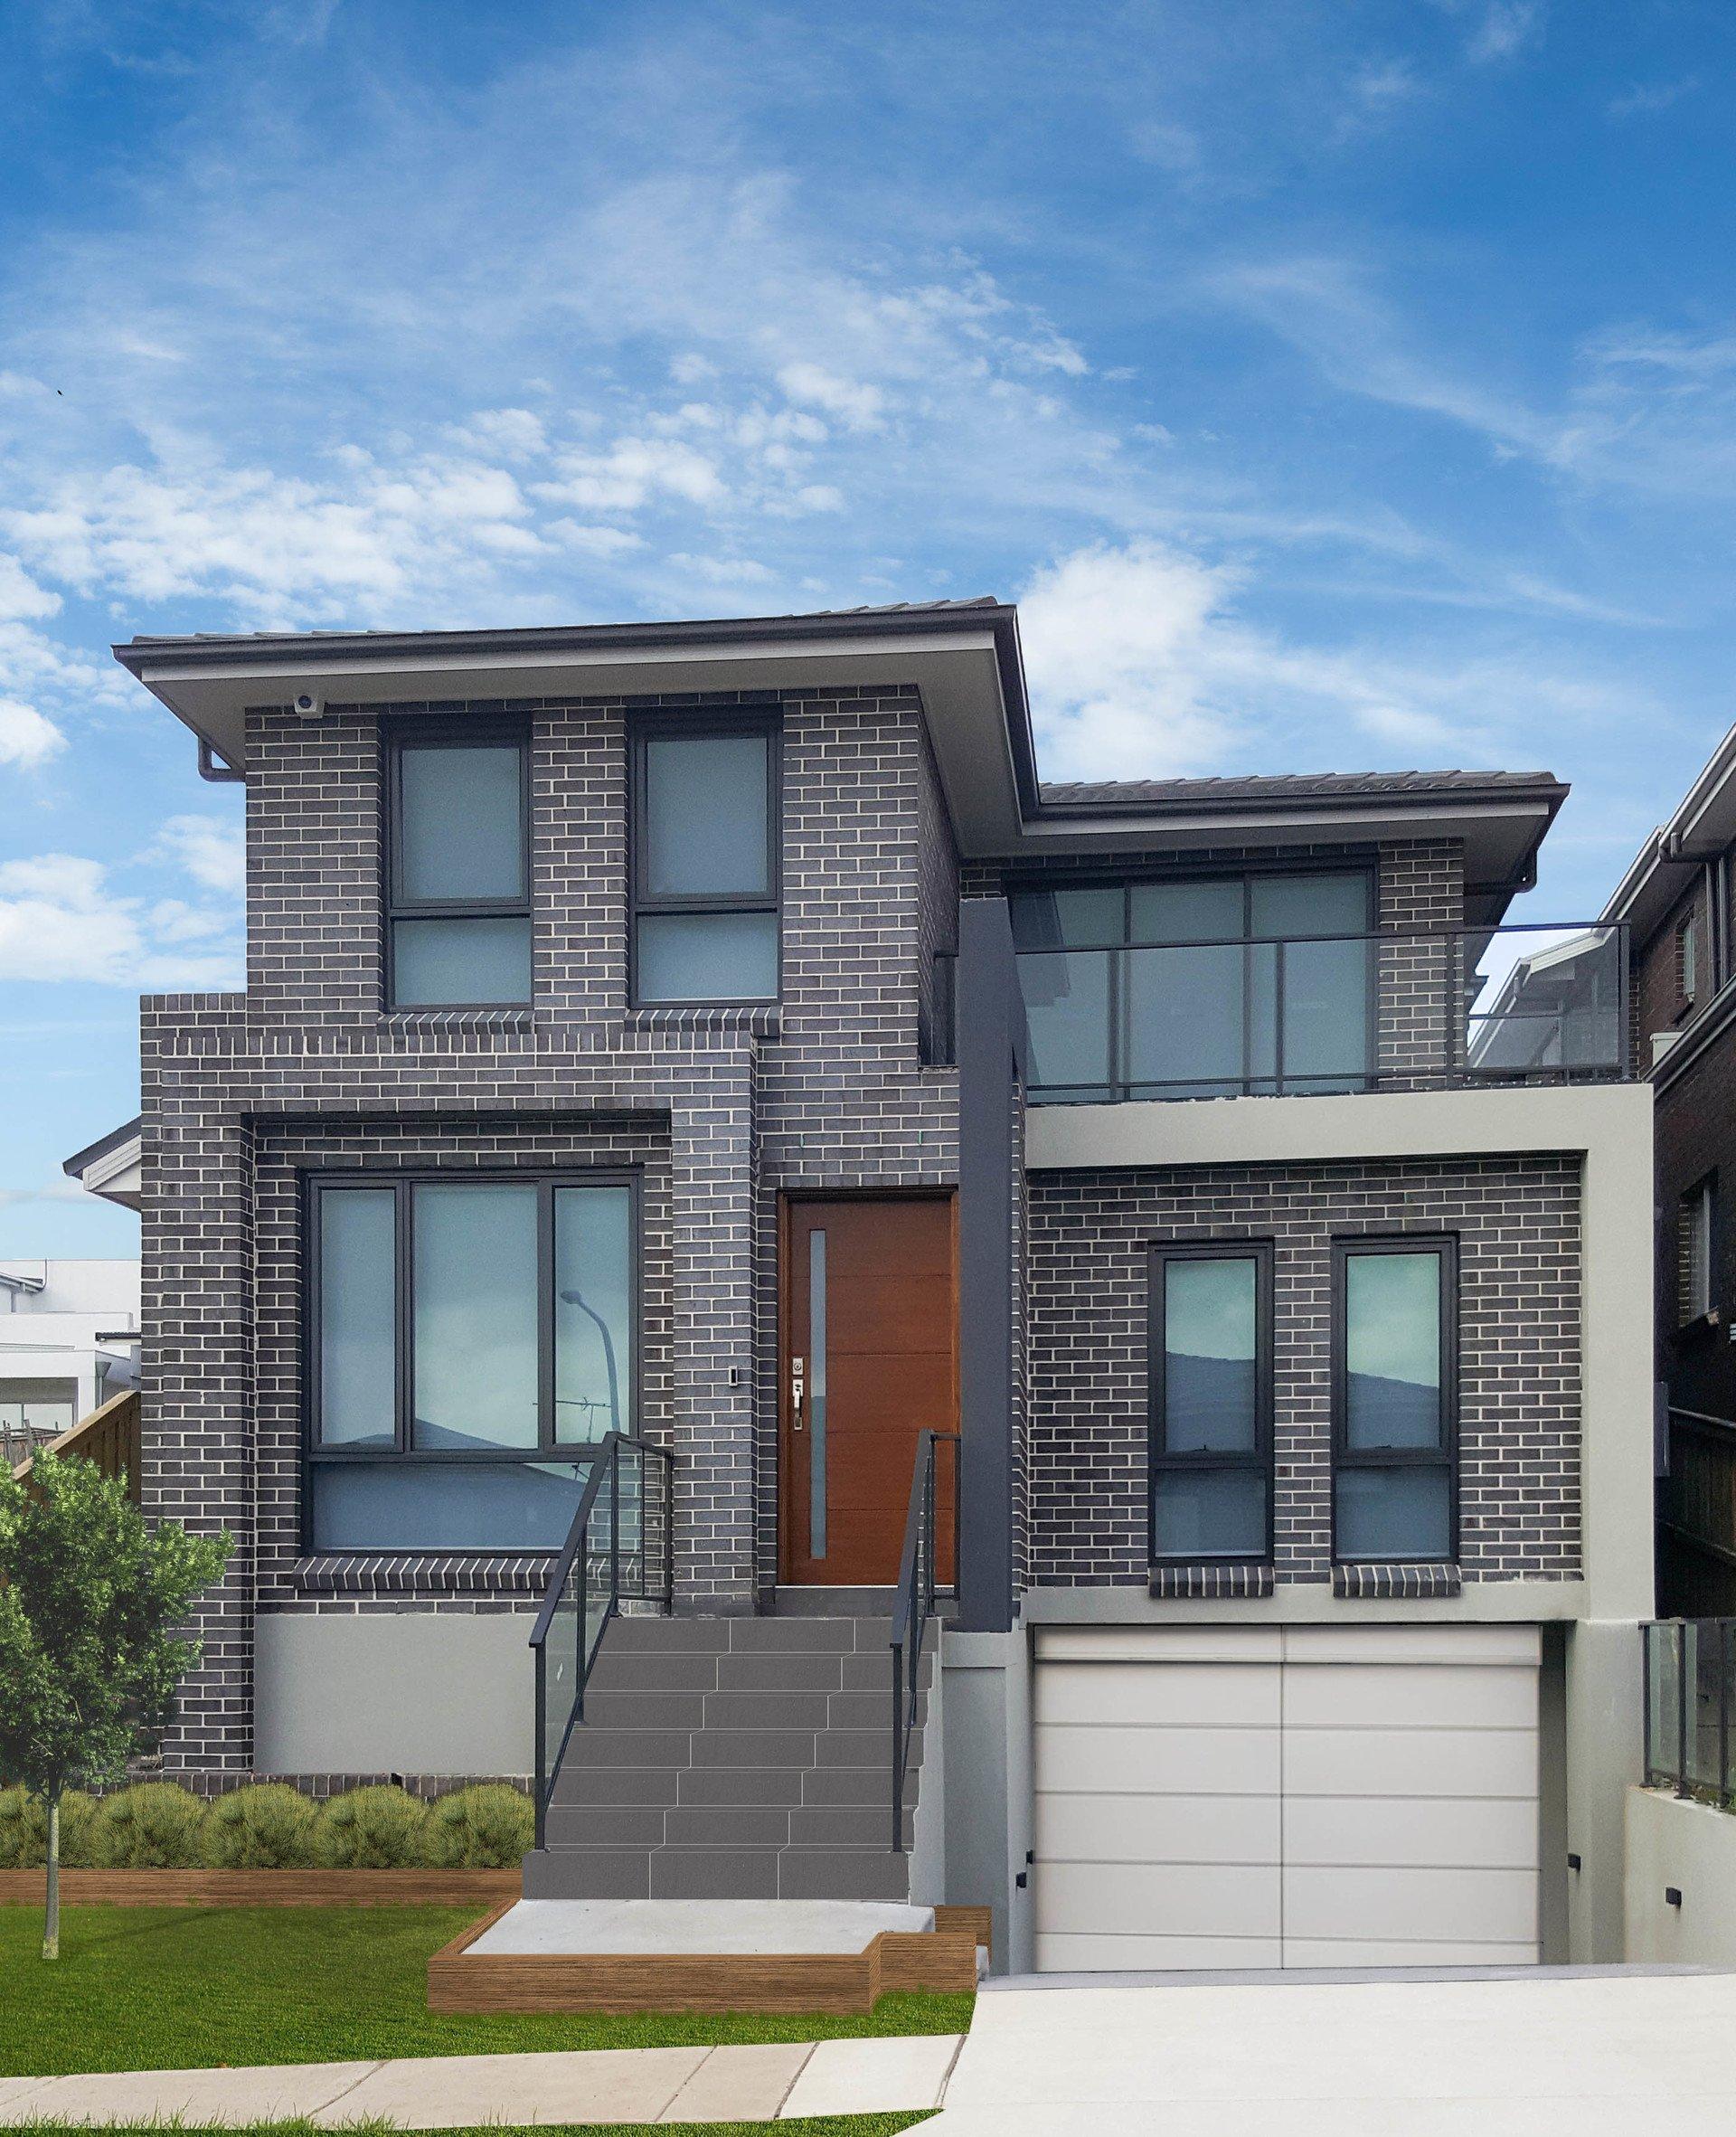 The Longi Double Storey Home